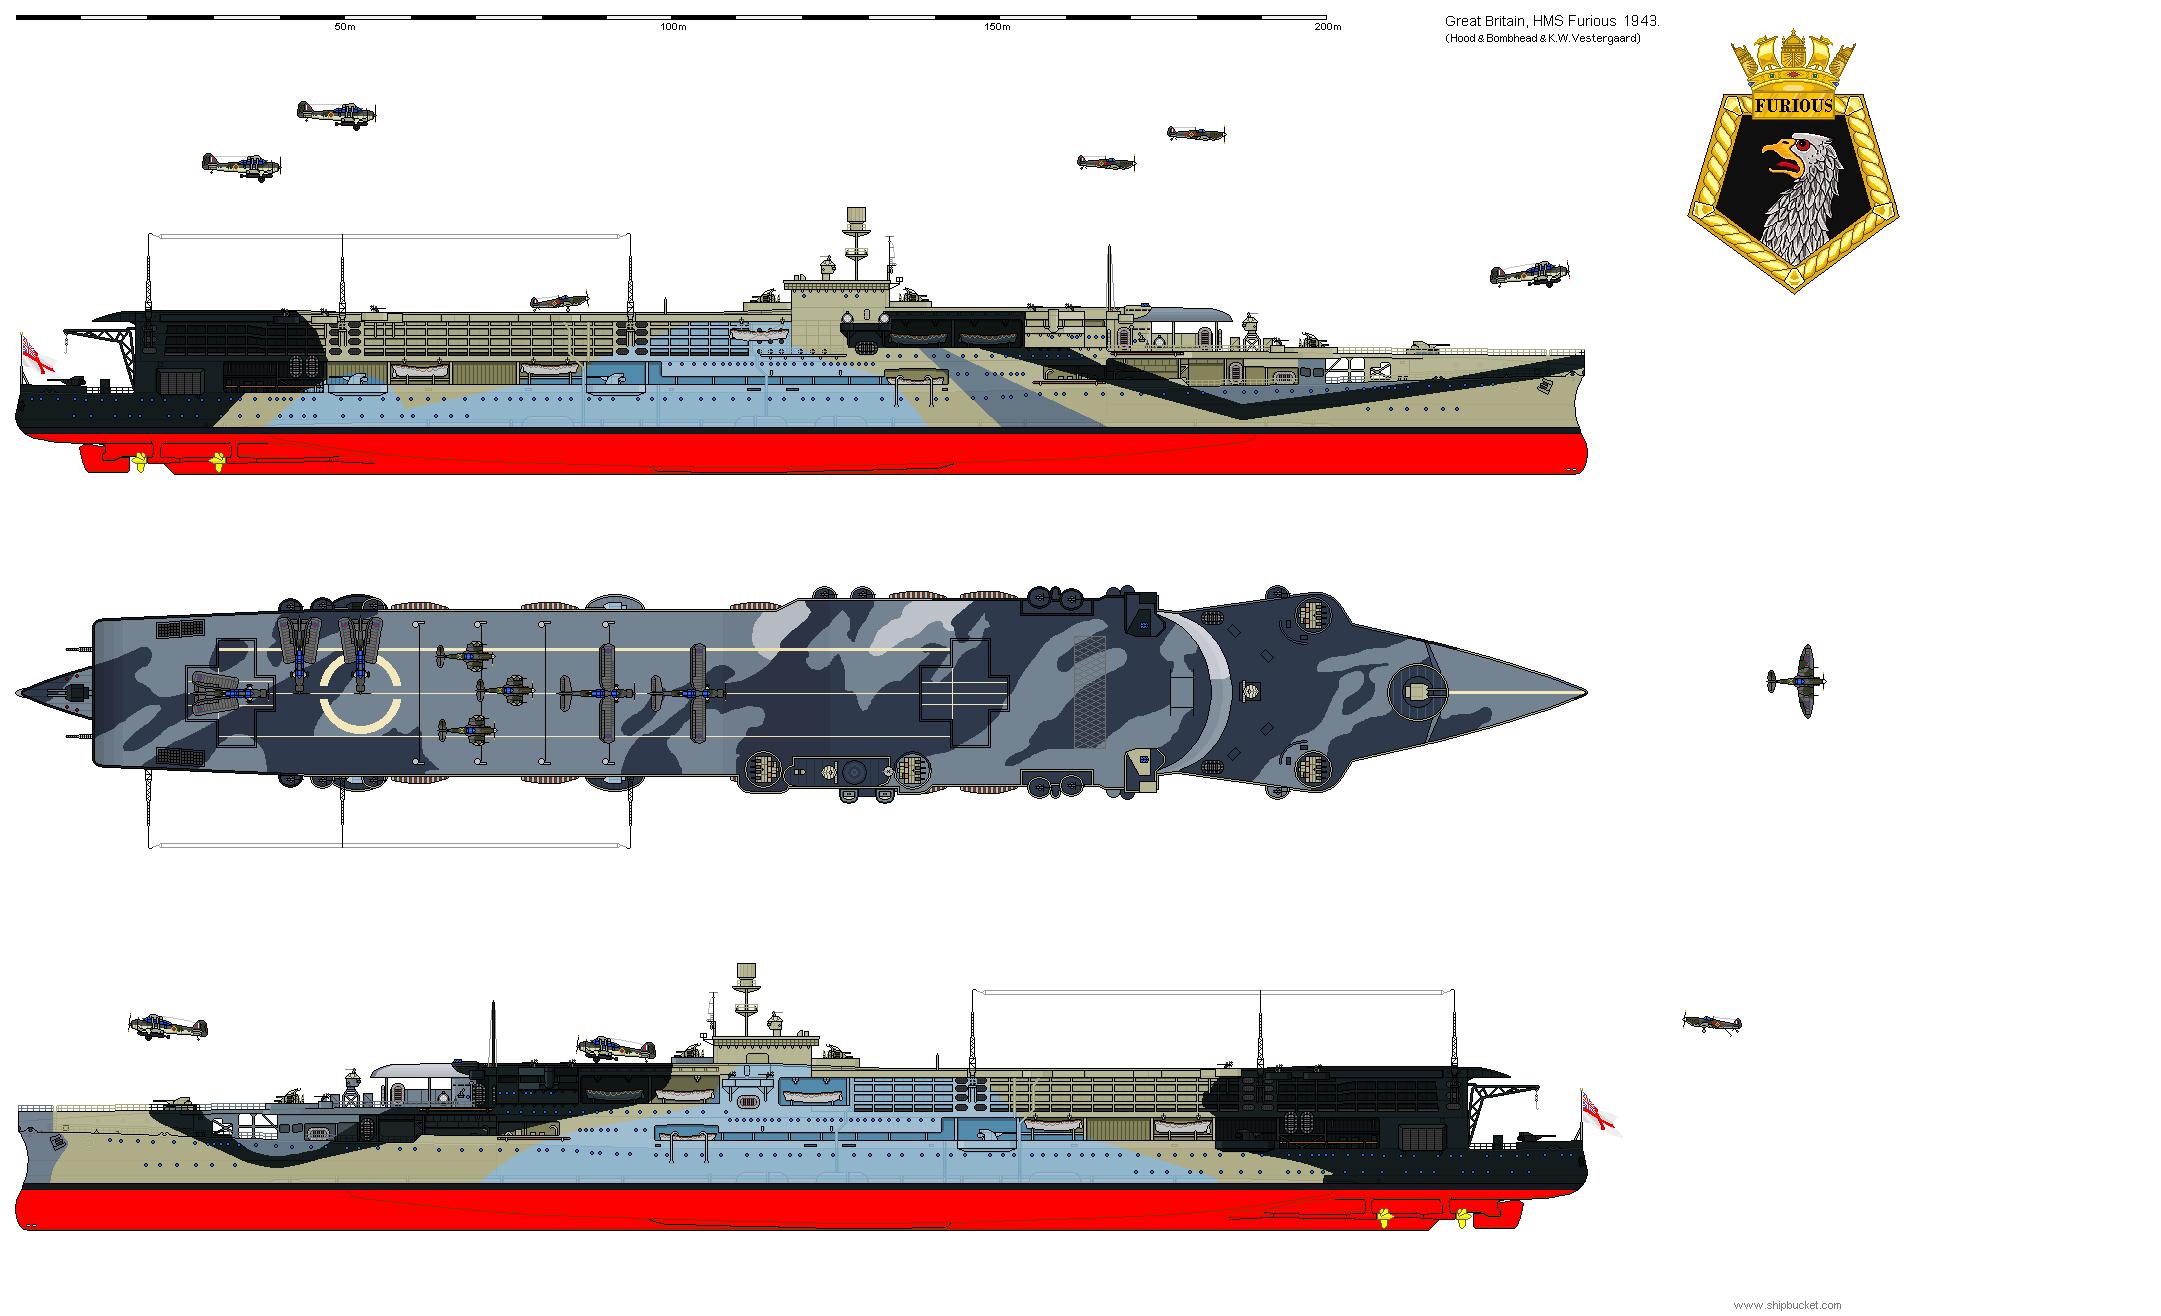 Real Designs Great Britain Cv 47 Furious 1943 Png Royal Navy Ships Royal Navy Aircraft Carriers Navy Carriers